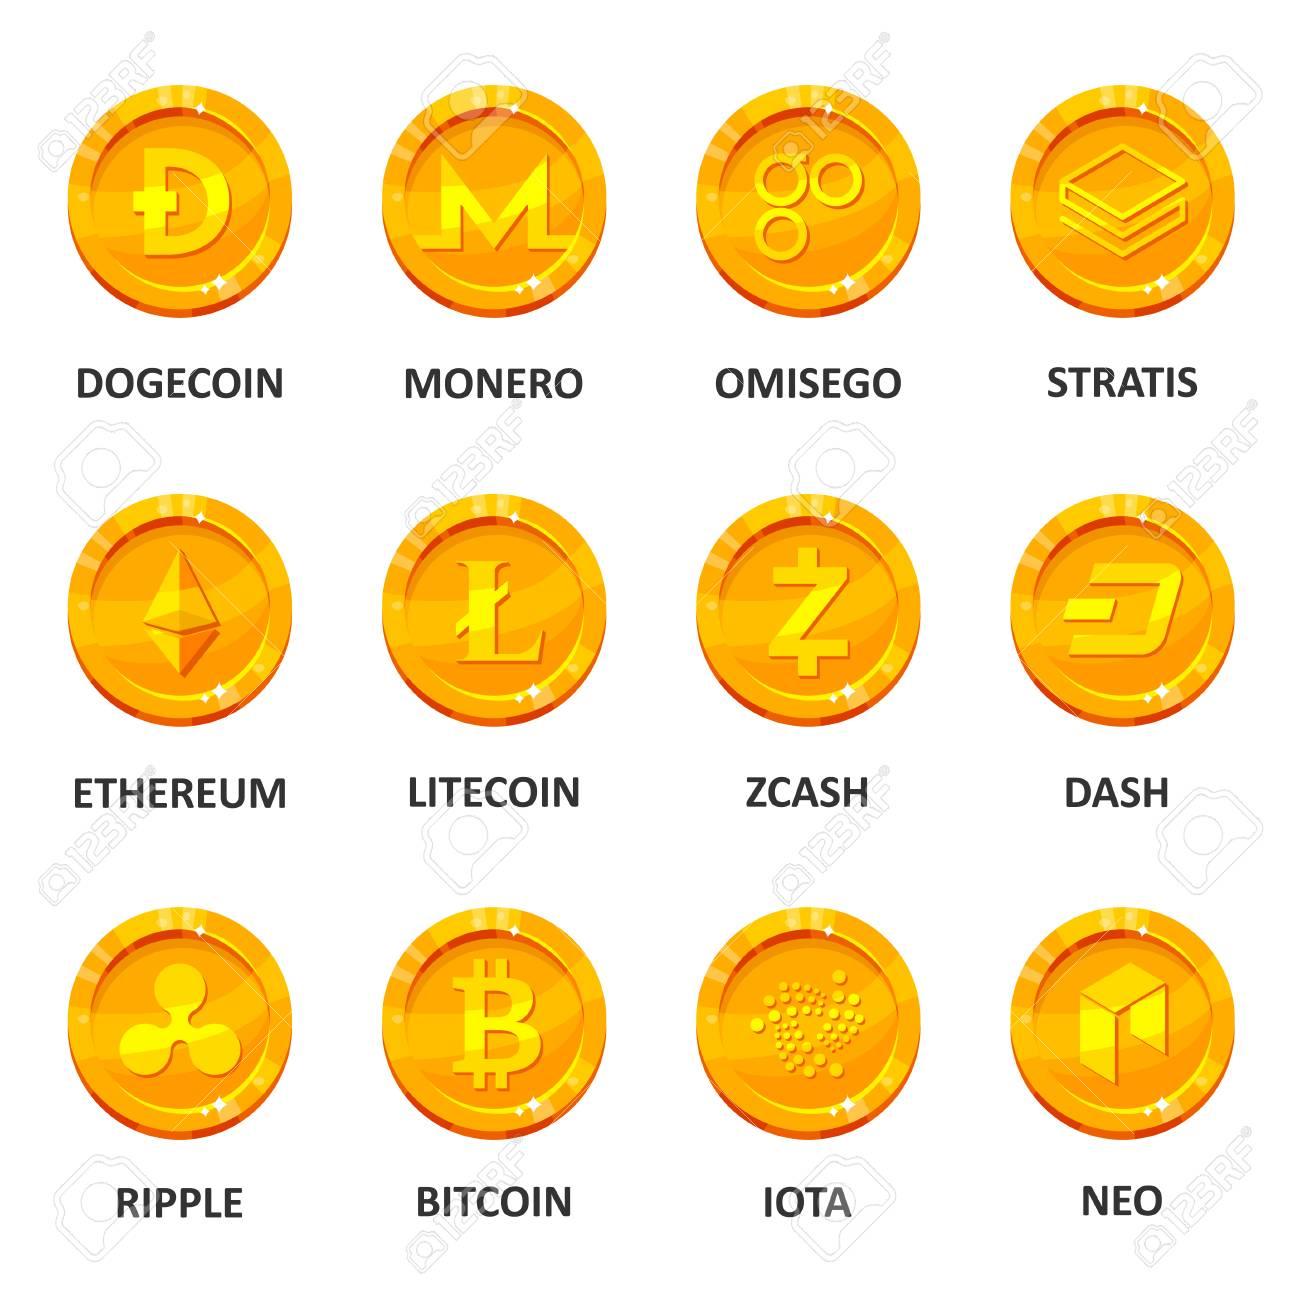 bitcoin trading valuta virtuale)